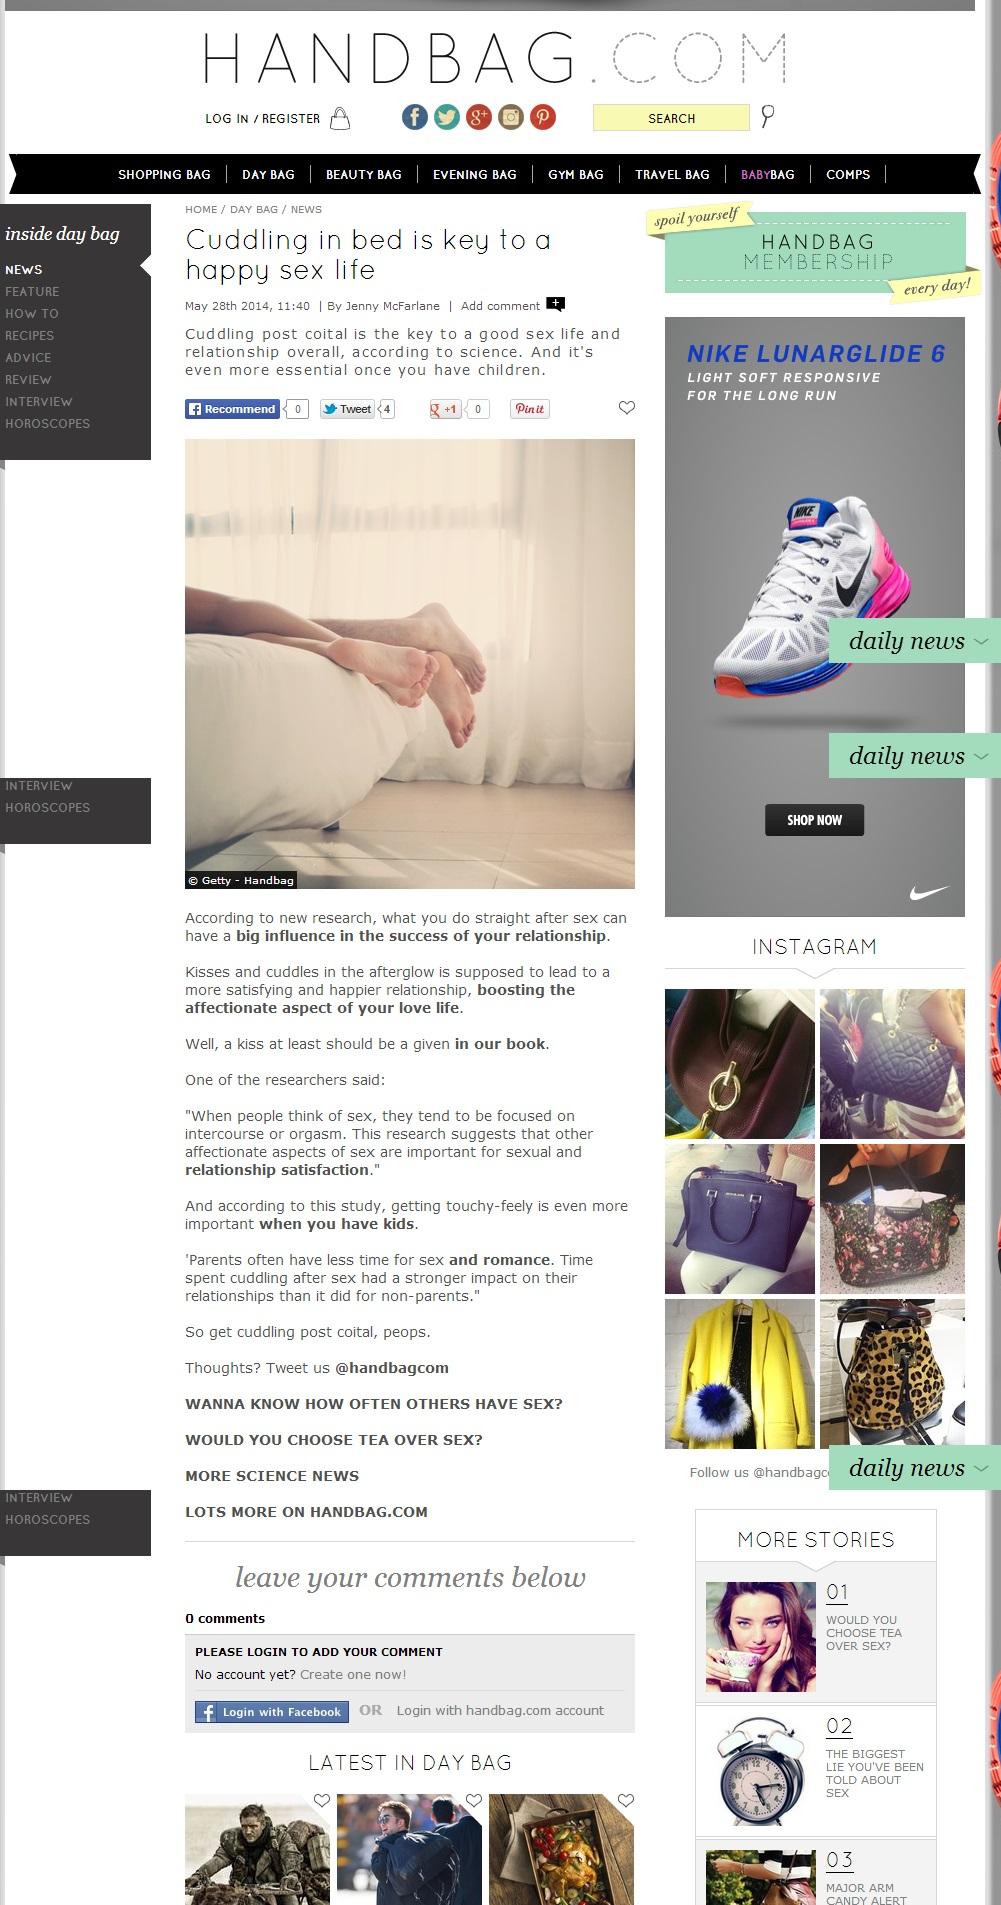 screencapture-www-handbag-com-day-bag-news-a573910-cuddling-in-bed-is-key-to-a-happy-sex-life-html